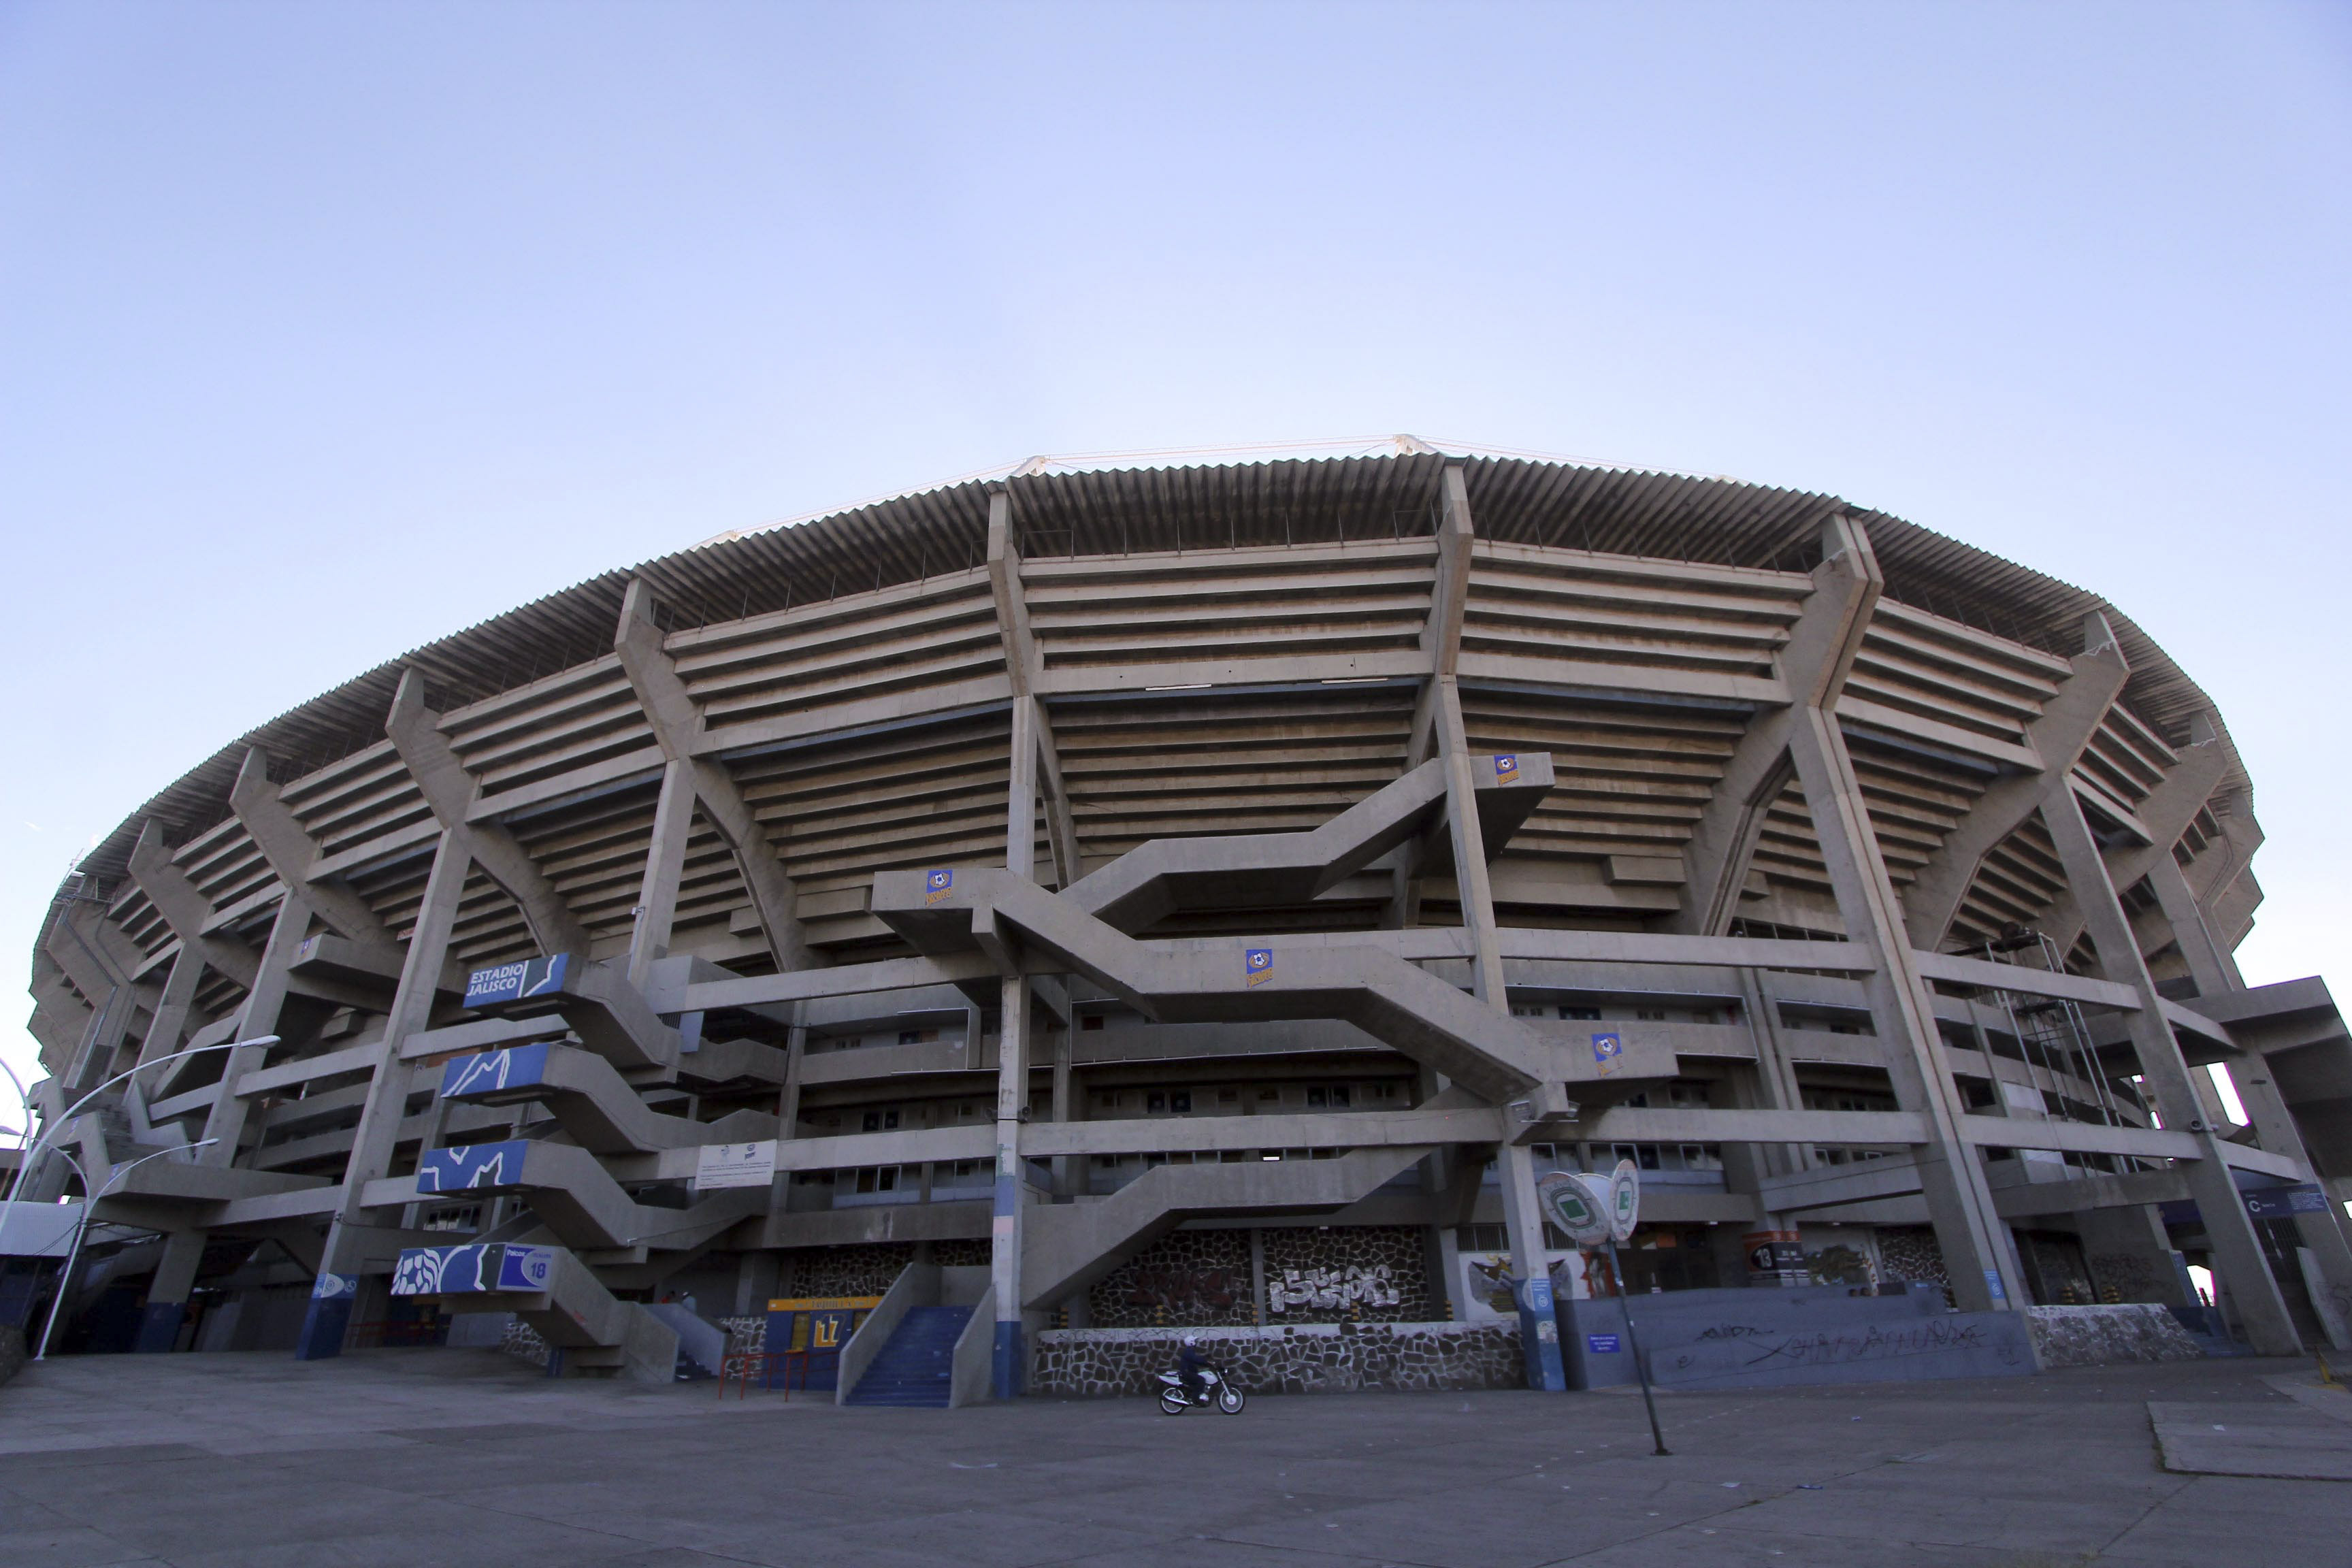 Visita-Estadio-Jalisco-fin-de-semana-Guadalajara